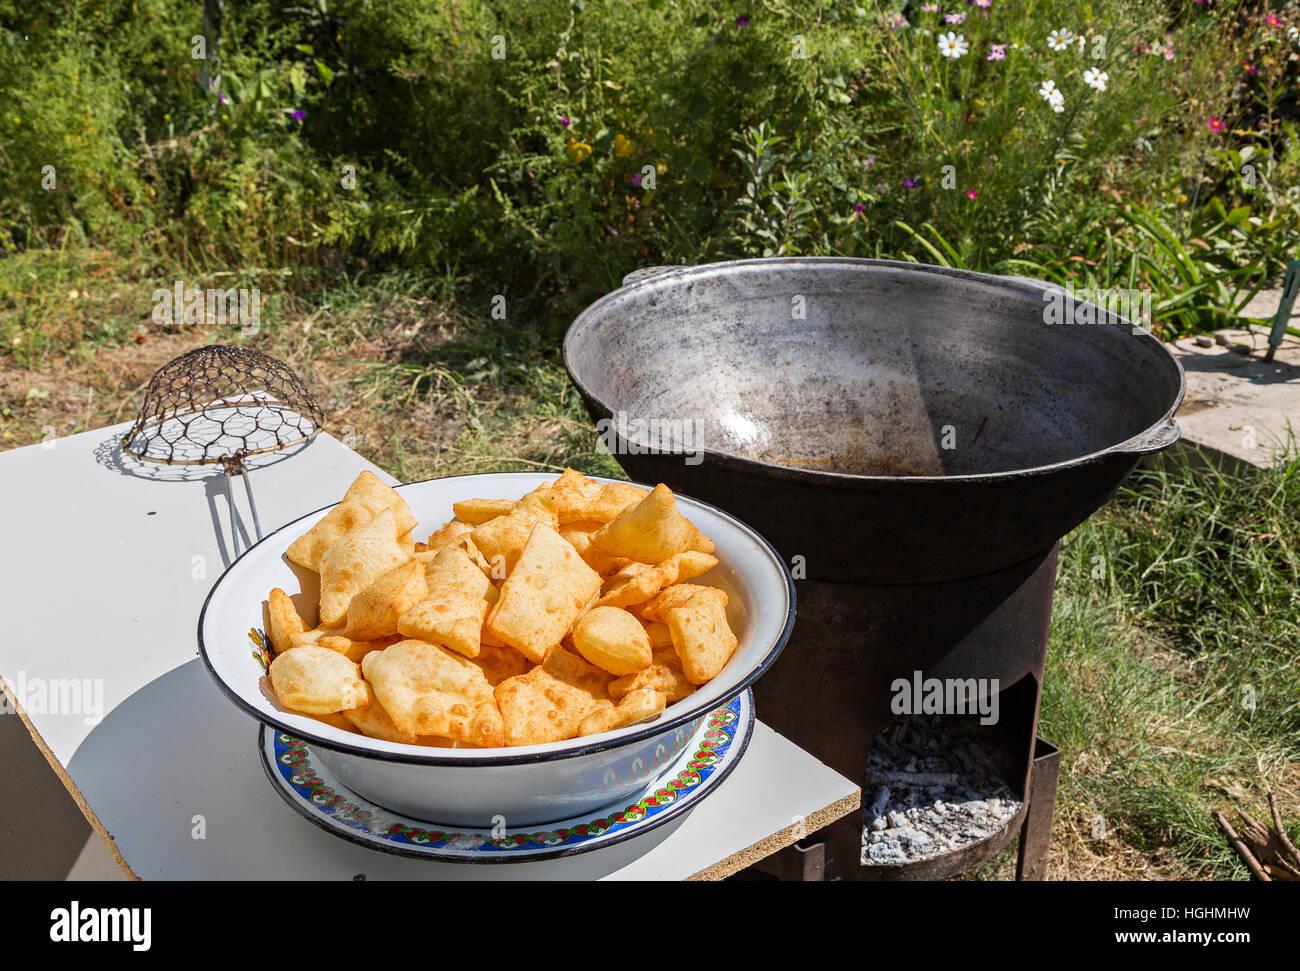 Fried puffy bread of Kazakhstan known as Baursak - Stock Image